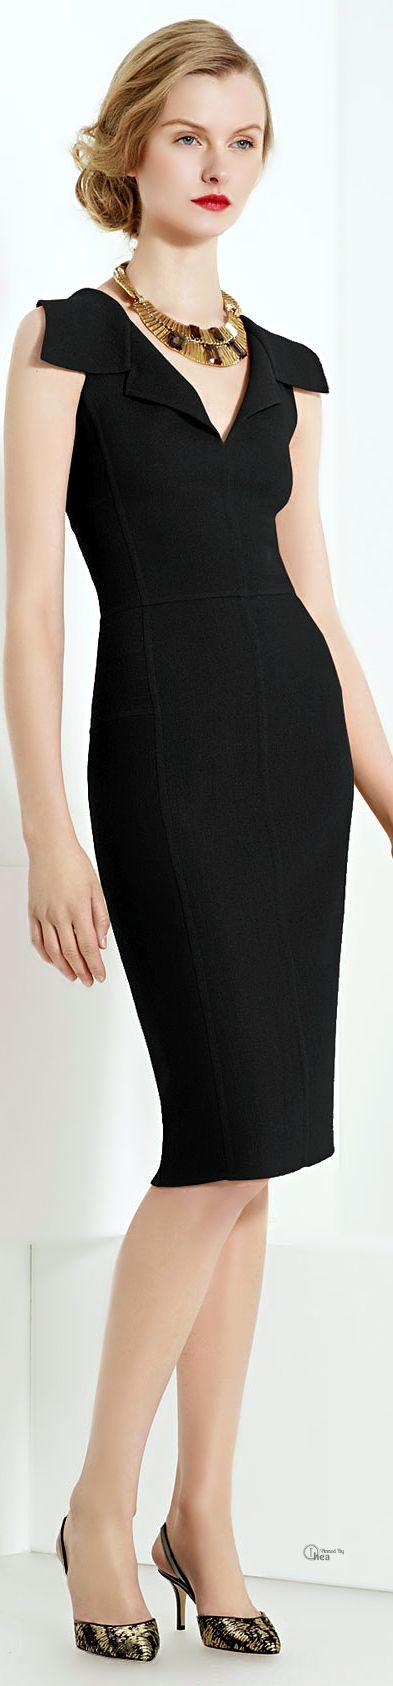 Oscar De La Renta ● Black Dress